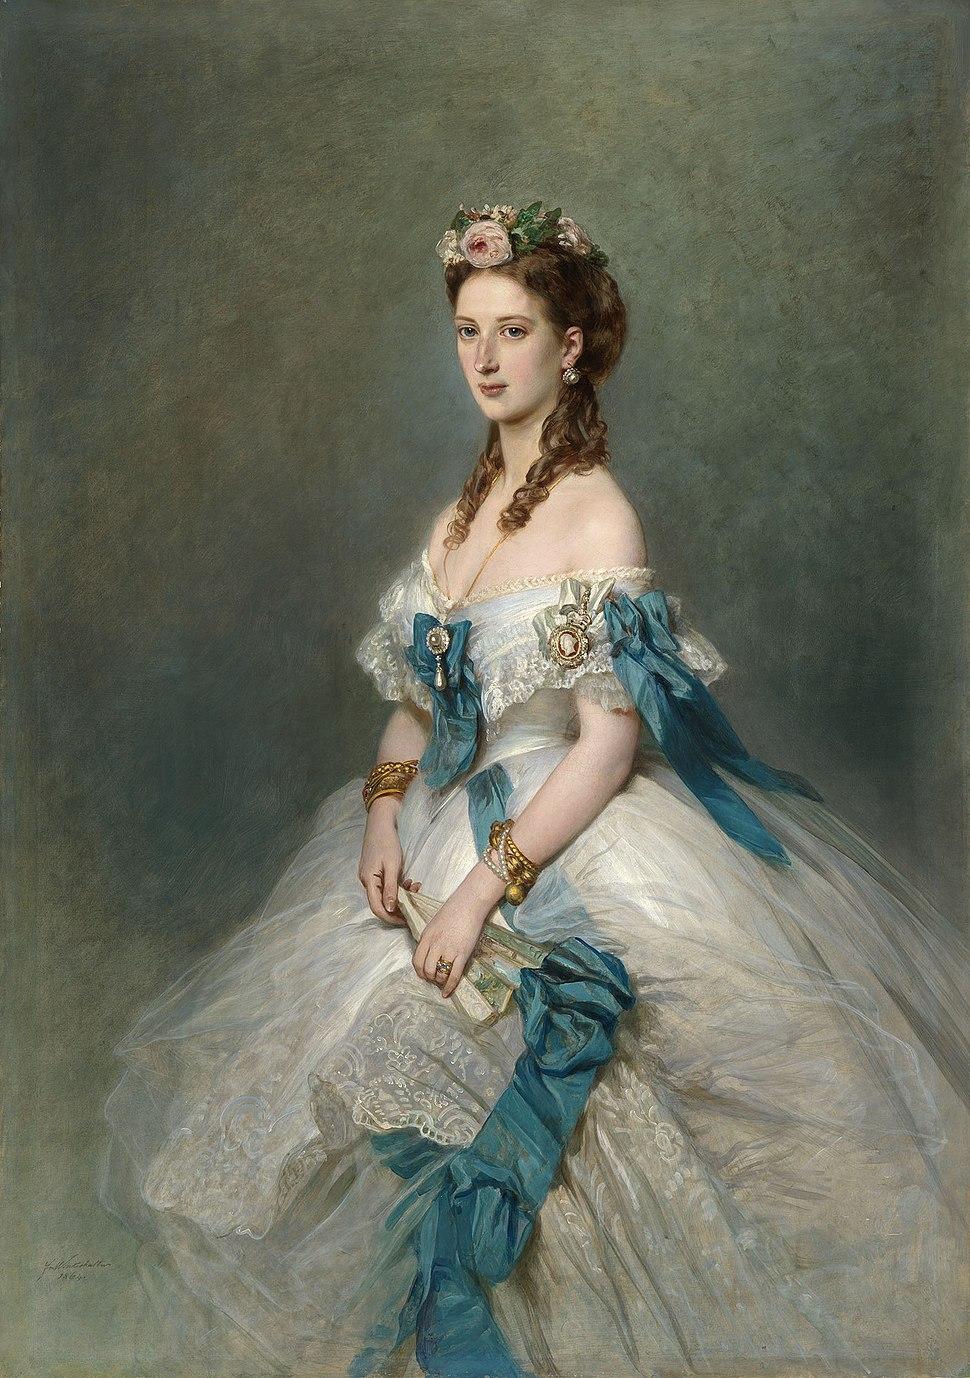 ALexandra of Denmark Princess of Wales